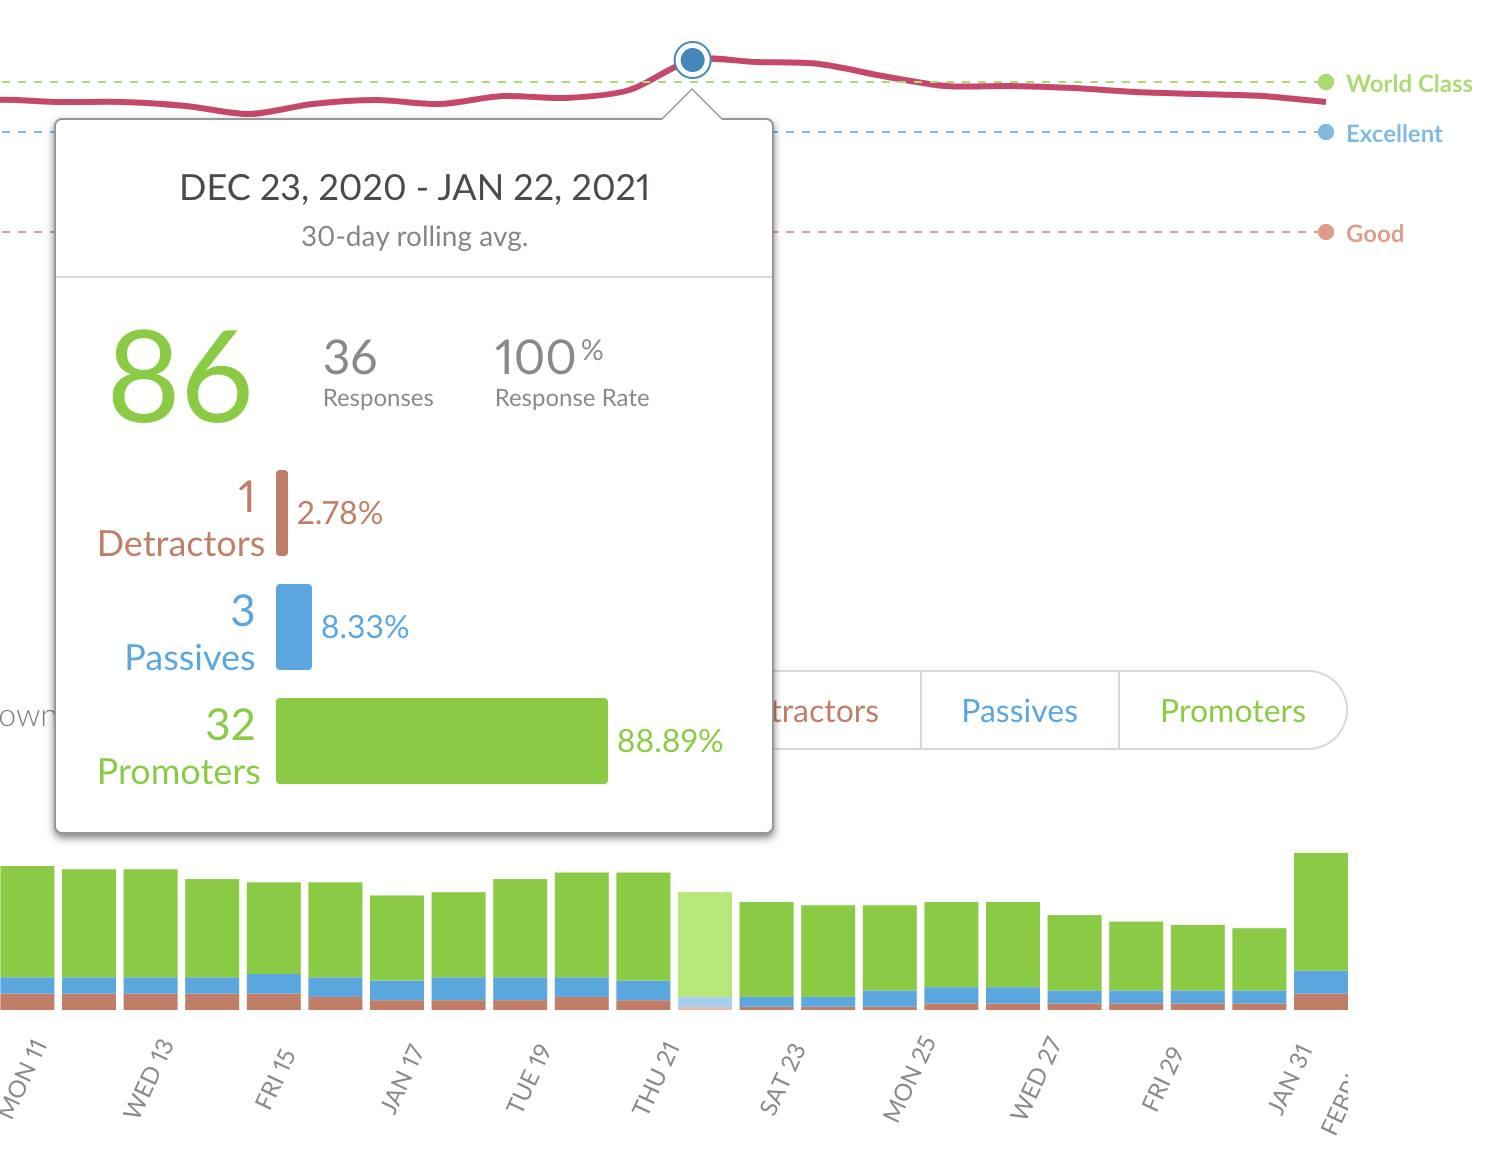 eSputnik survey results, December 2020 – January 2021